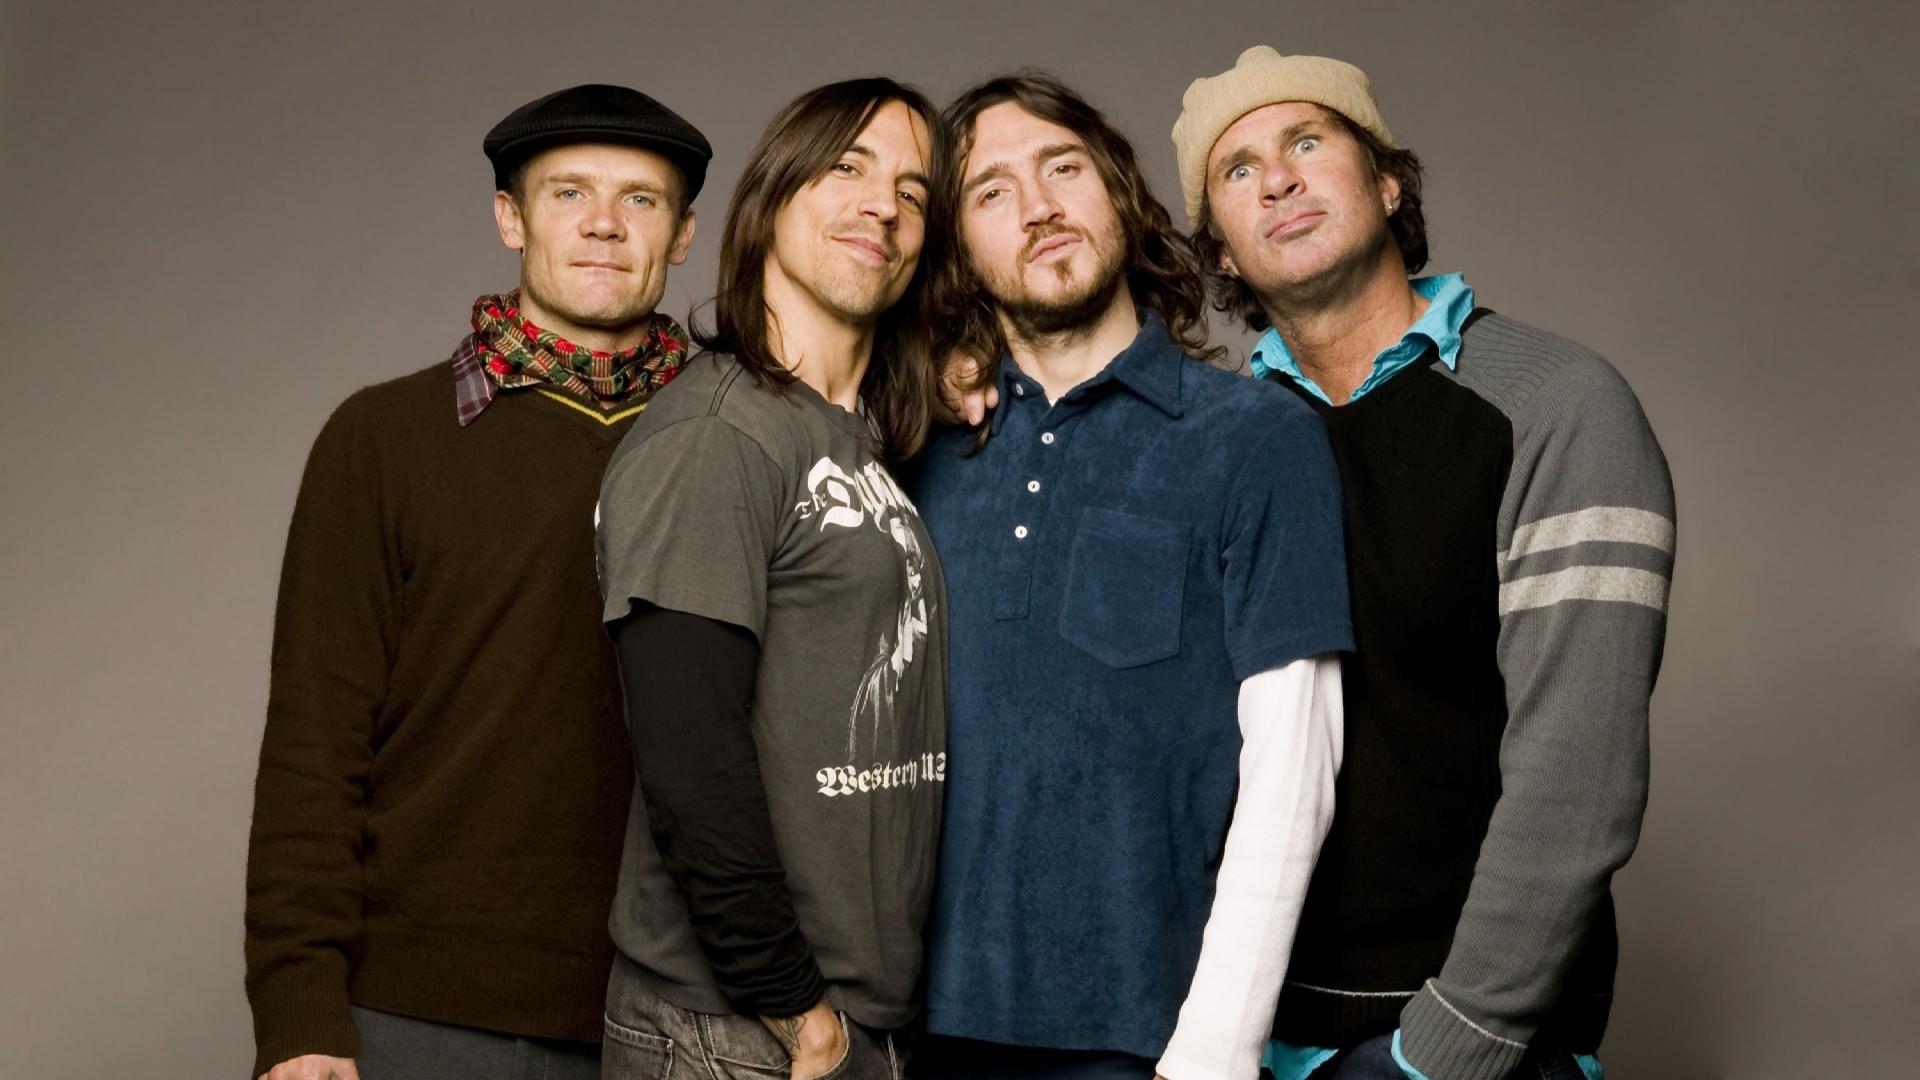 Red Hot Chili Peppers | Music fanart | fanart.tv